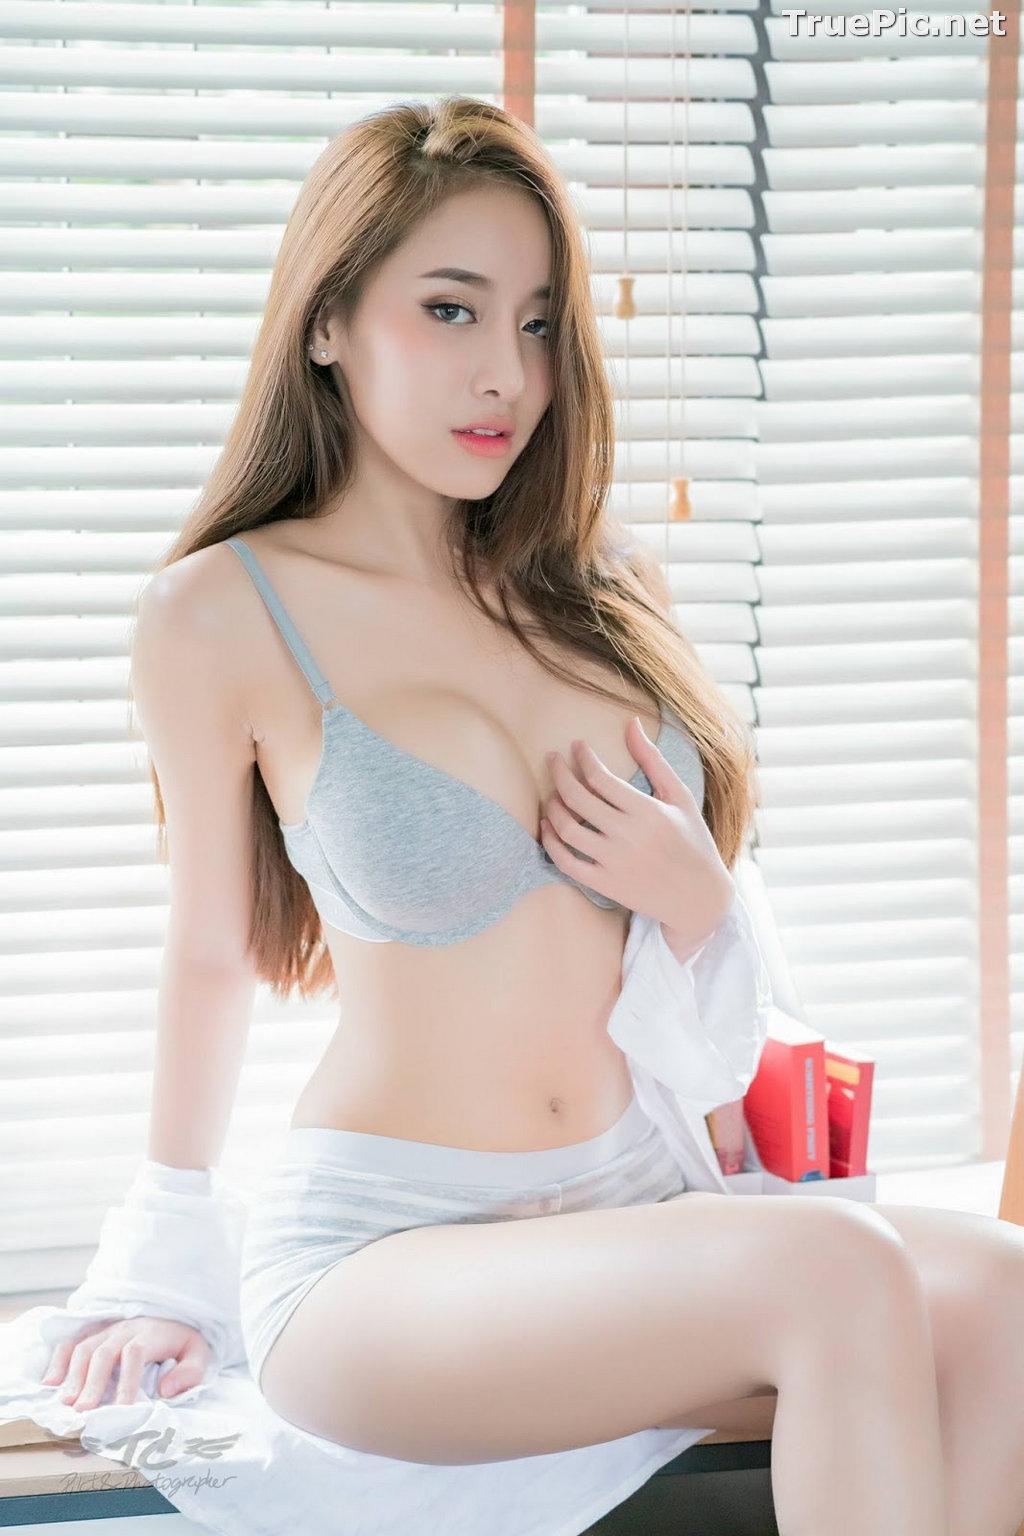 Image Thailand Sexy Model - Pichana Yoosuk - Waiting For Love - TruePic.net - Picture-5